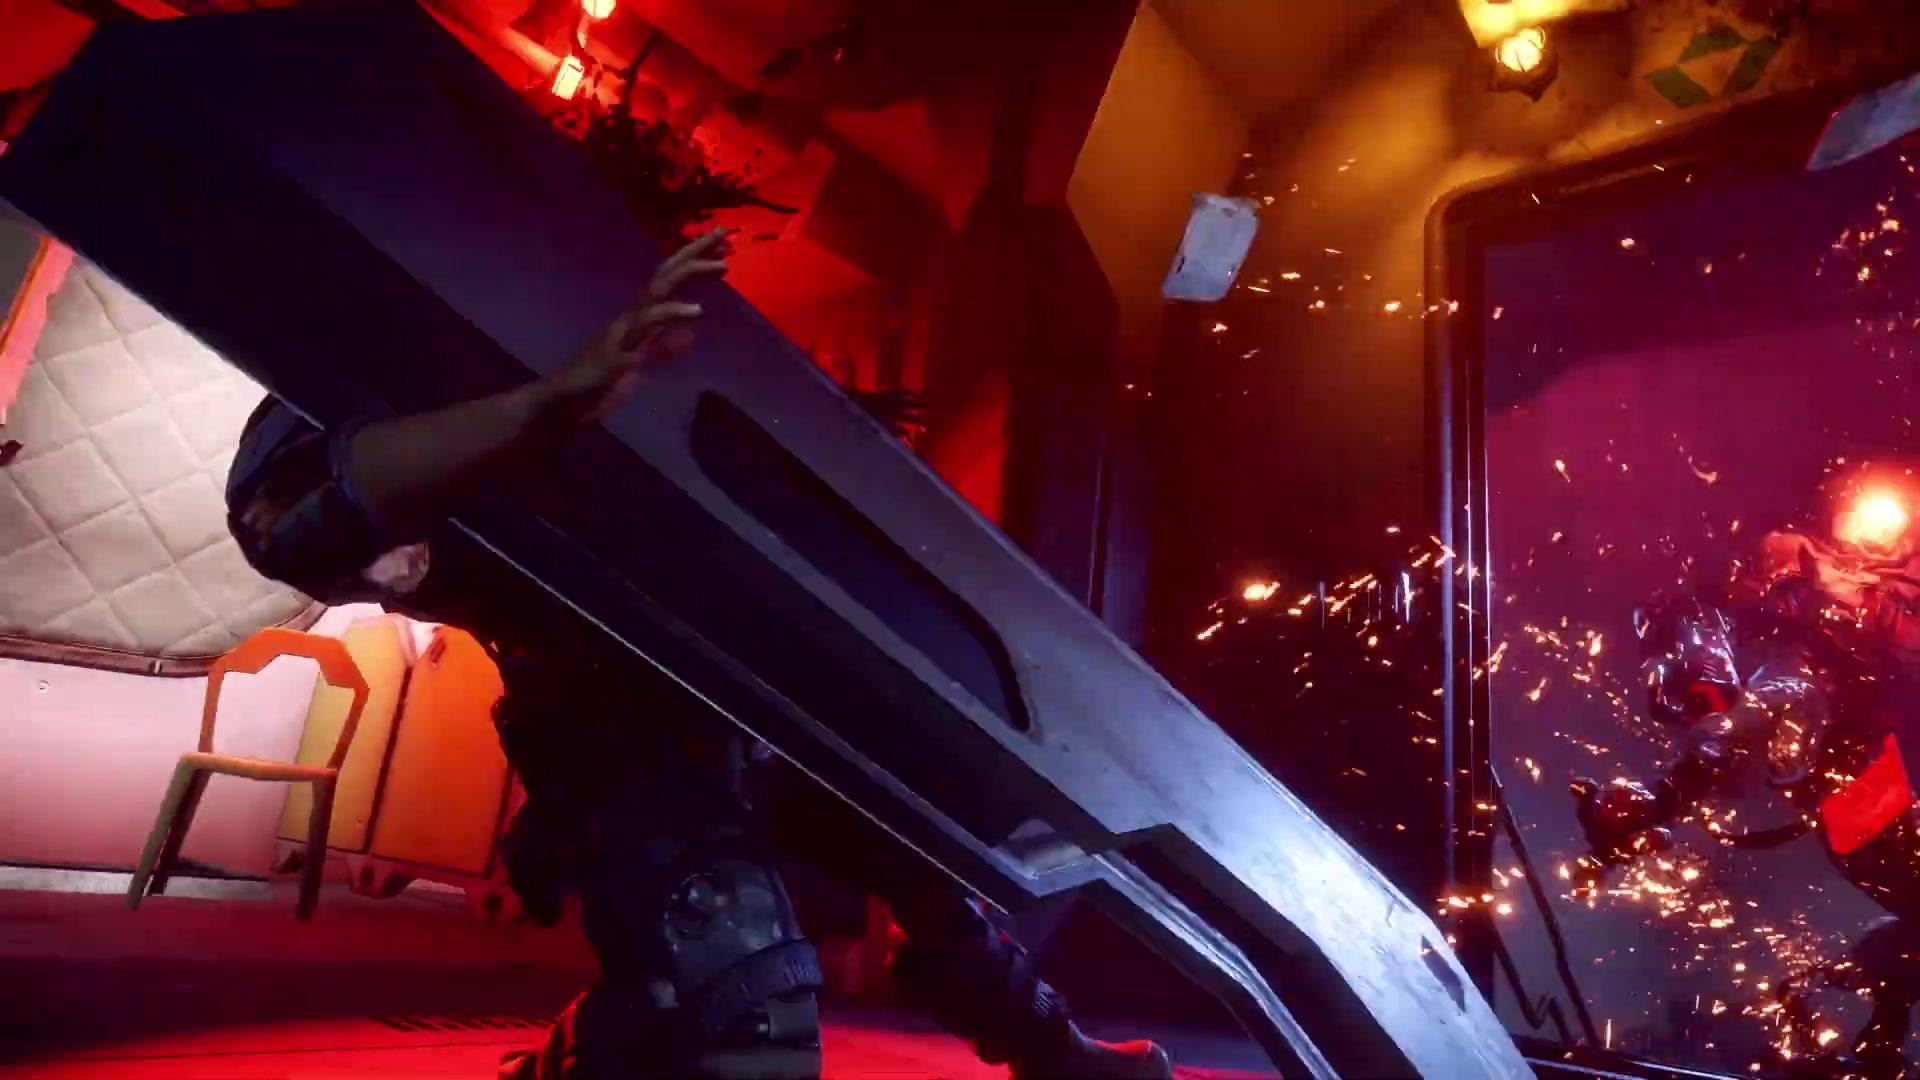 B社公布《狂怒2》新视频Everythingvs.Me视频折小提琴图片